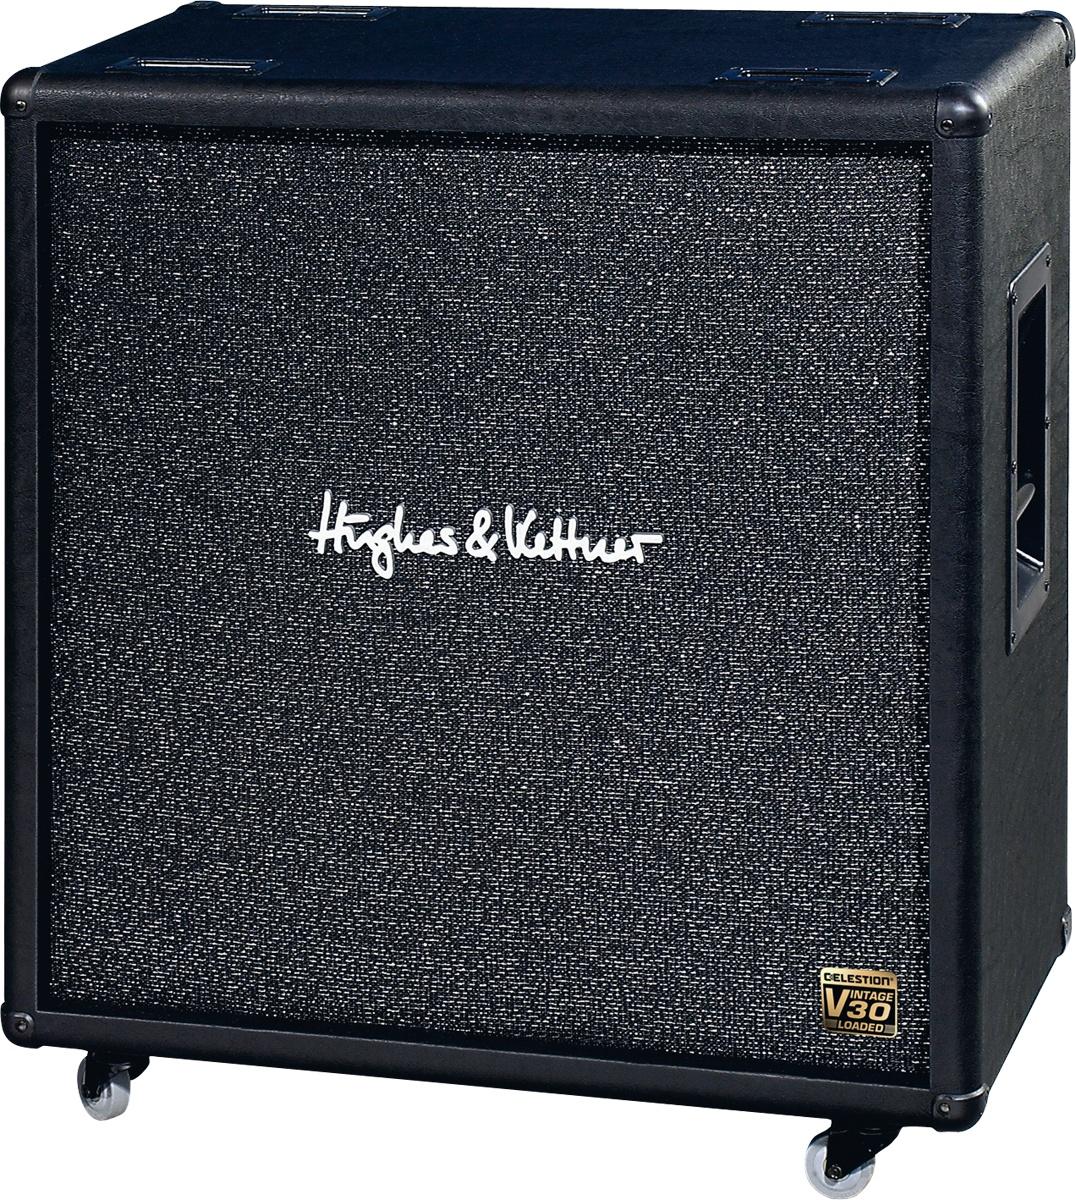 Hughes & Kettner Vc412b30 - Vintage 30